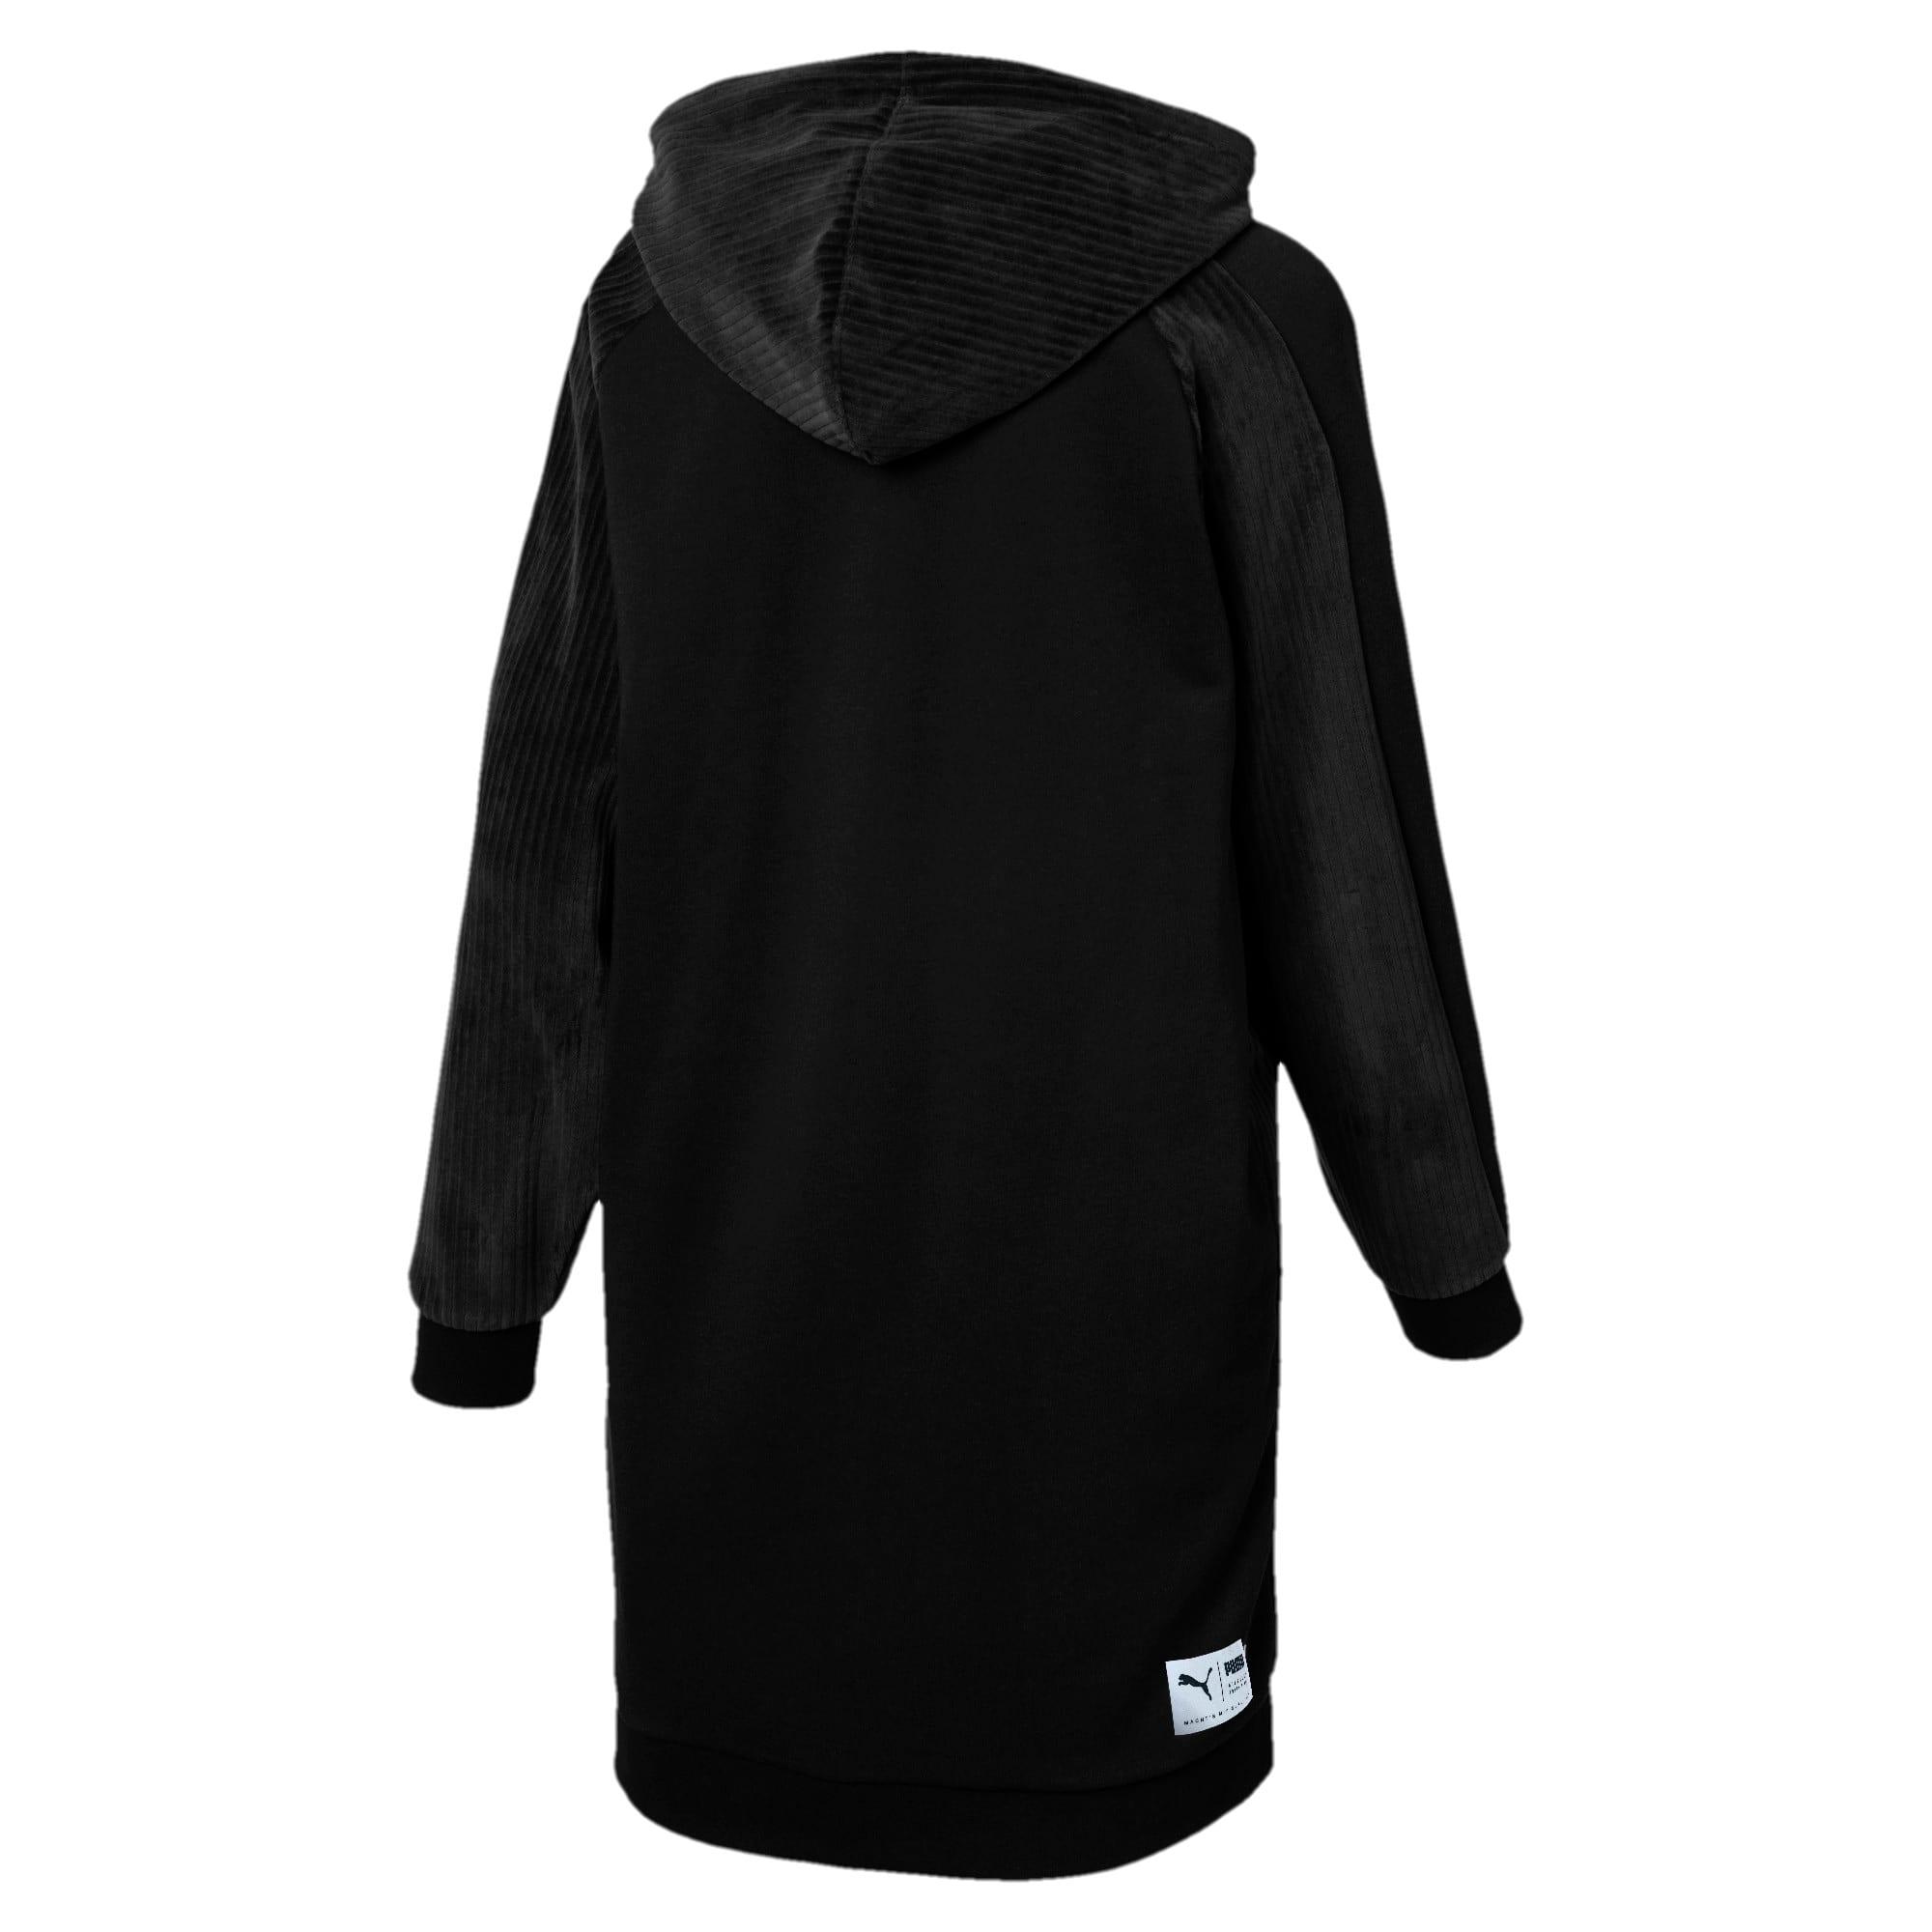 Thumbnail 4 of Downtown Long Sleeve Hooded Women's Dress, Cotton Black, medium